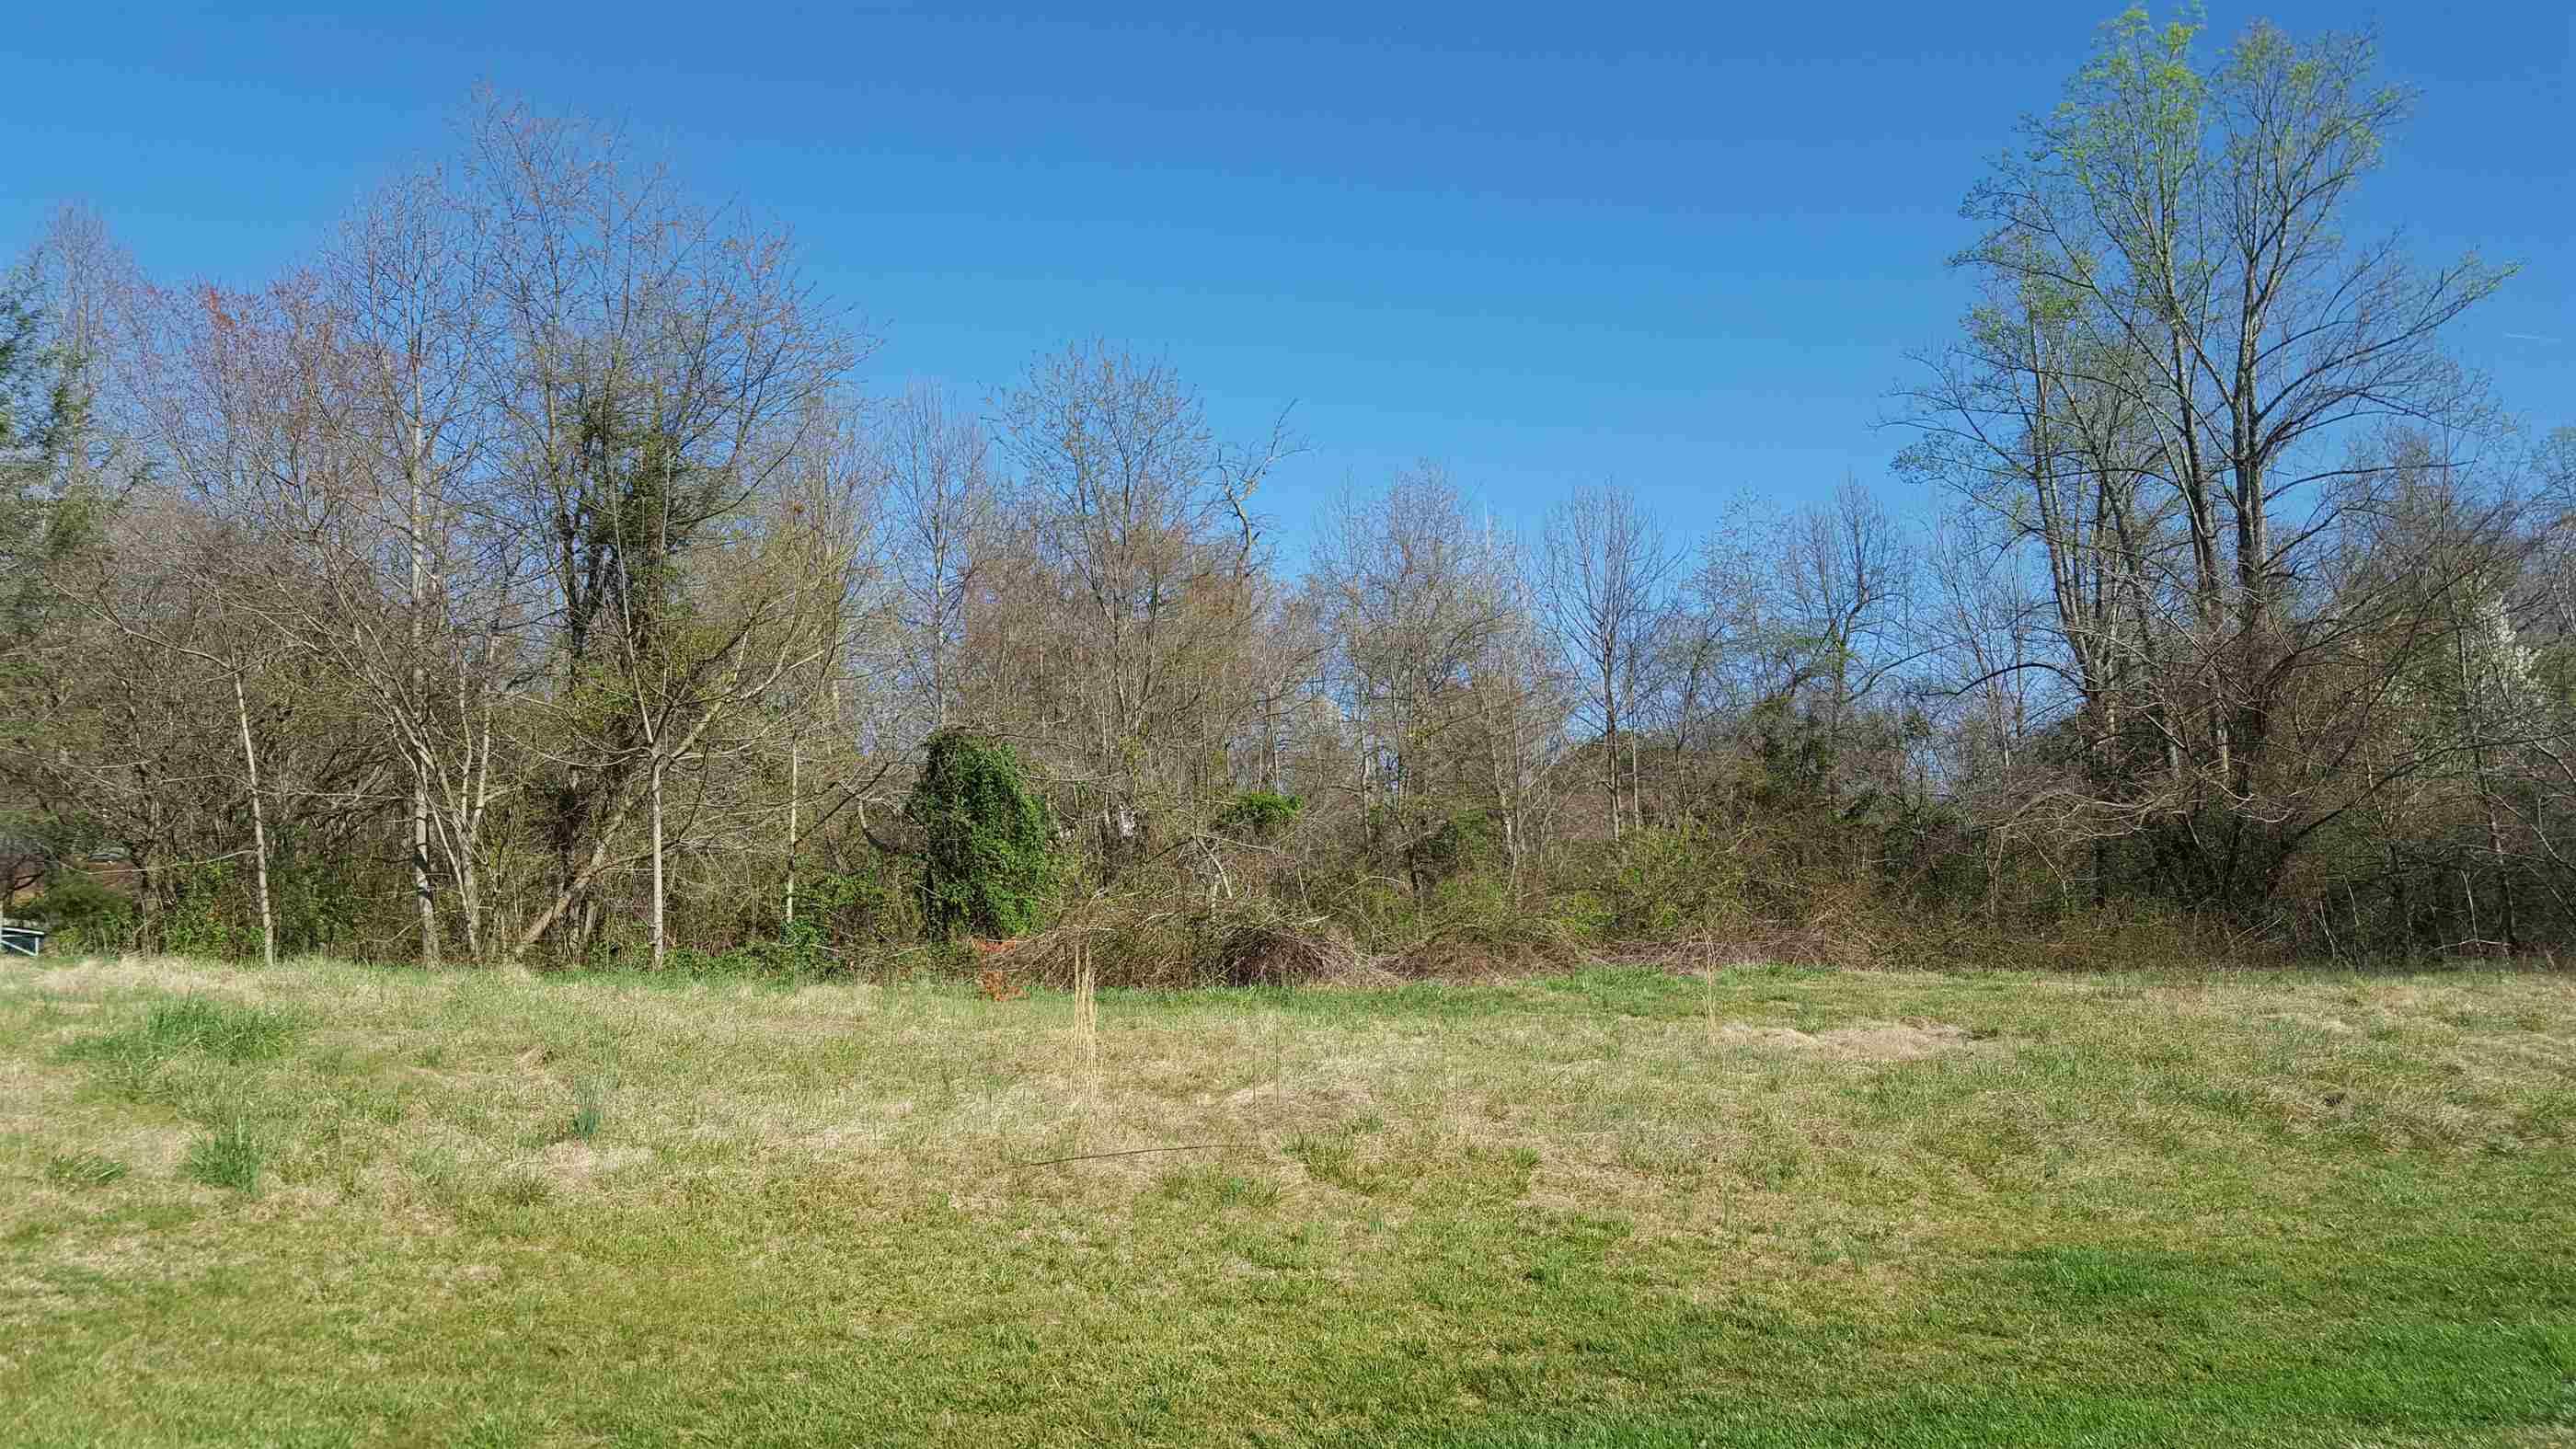 Photo of 11041106 Rambling Acres Cir  Lenoir  NC